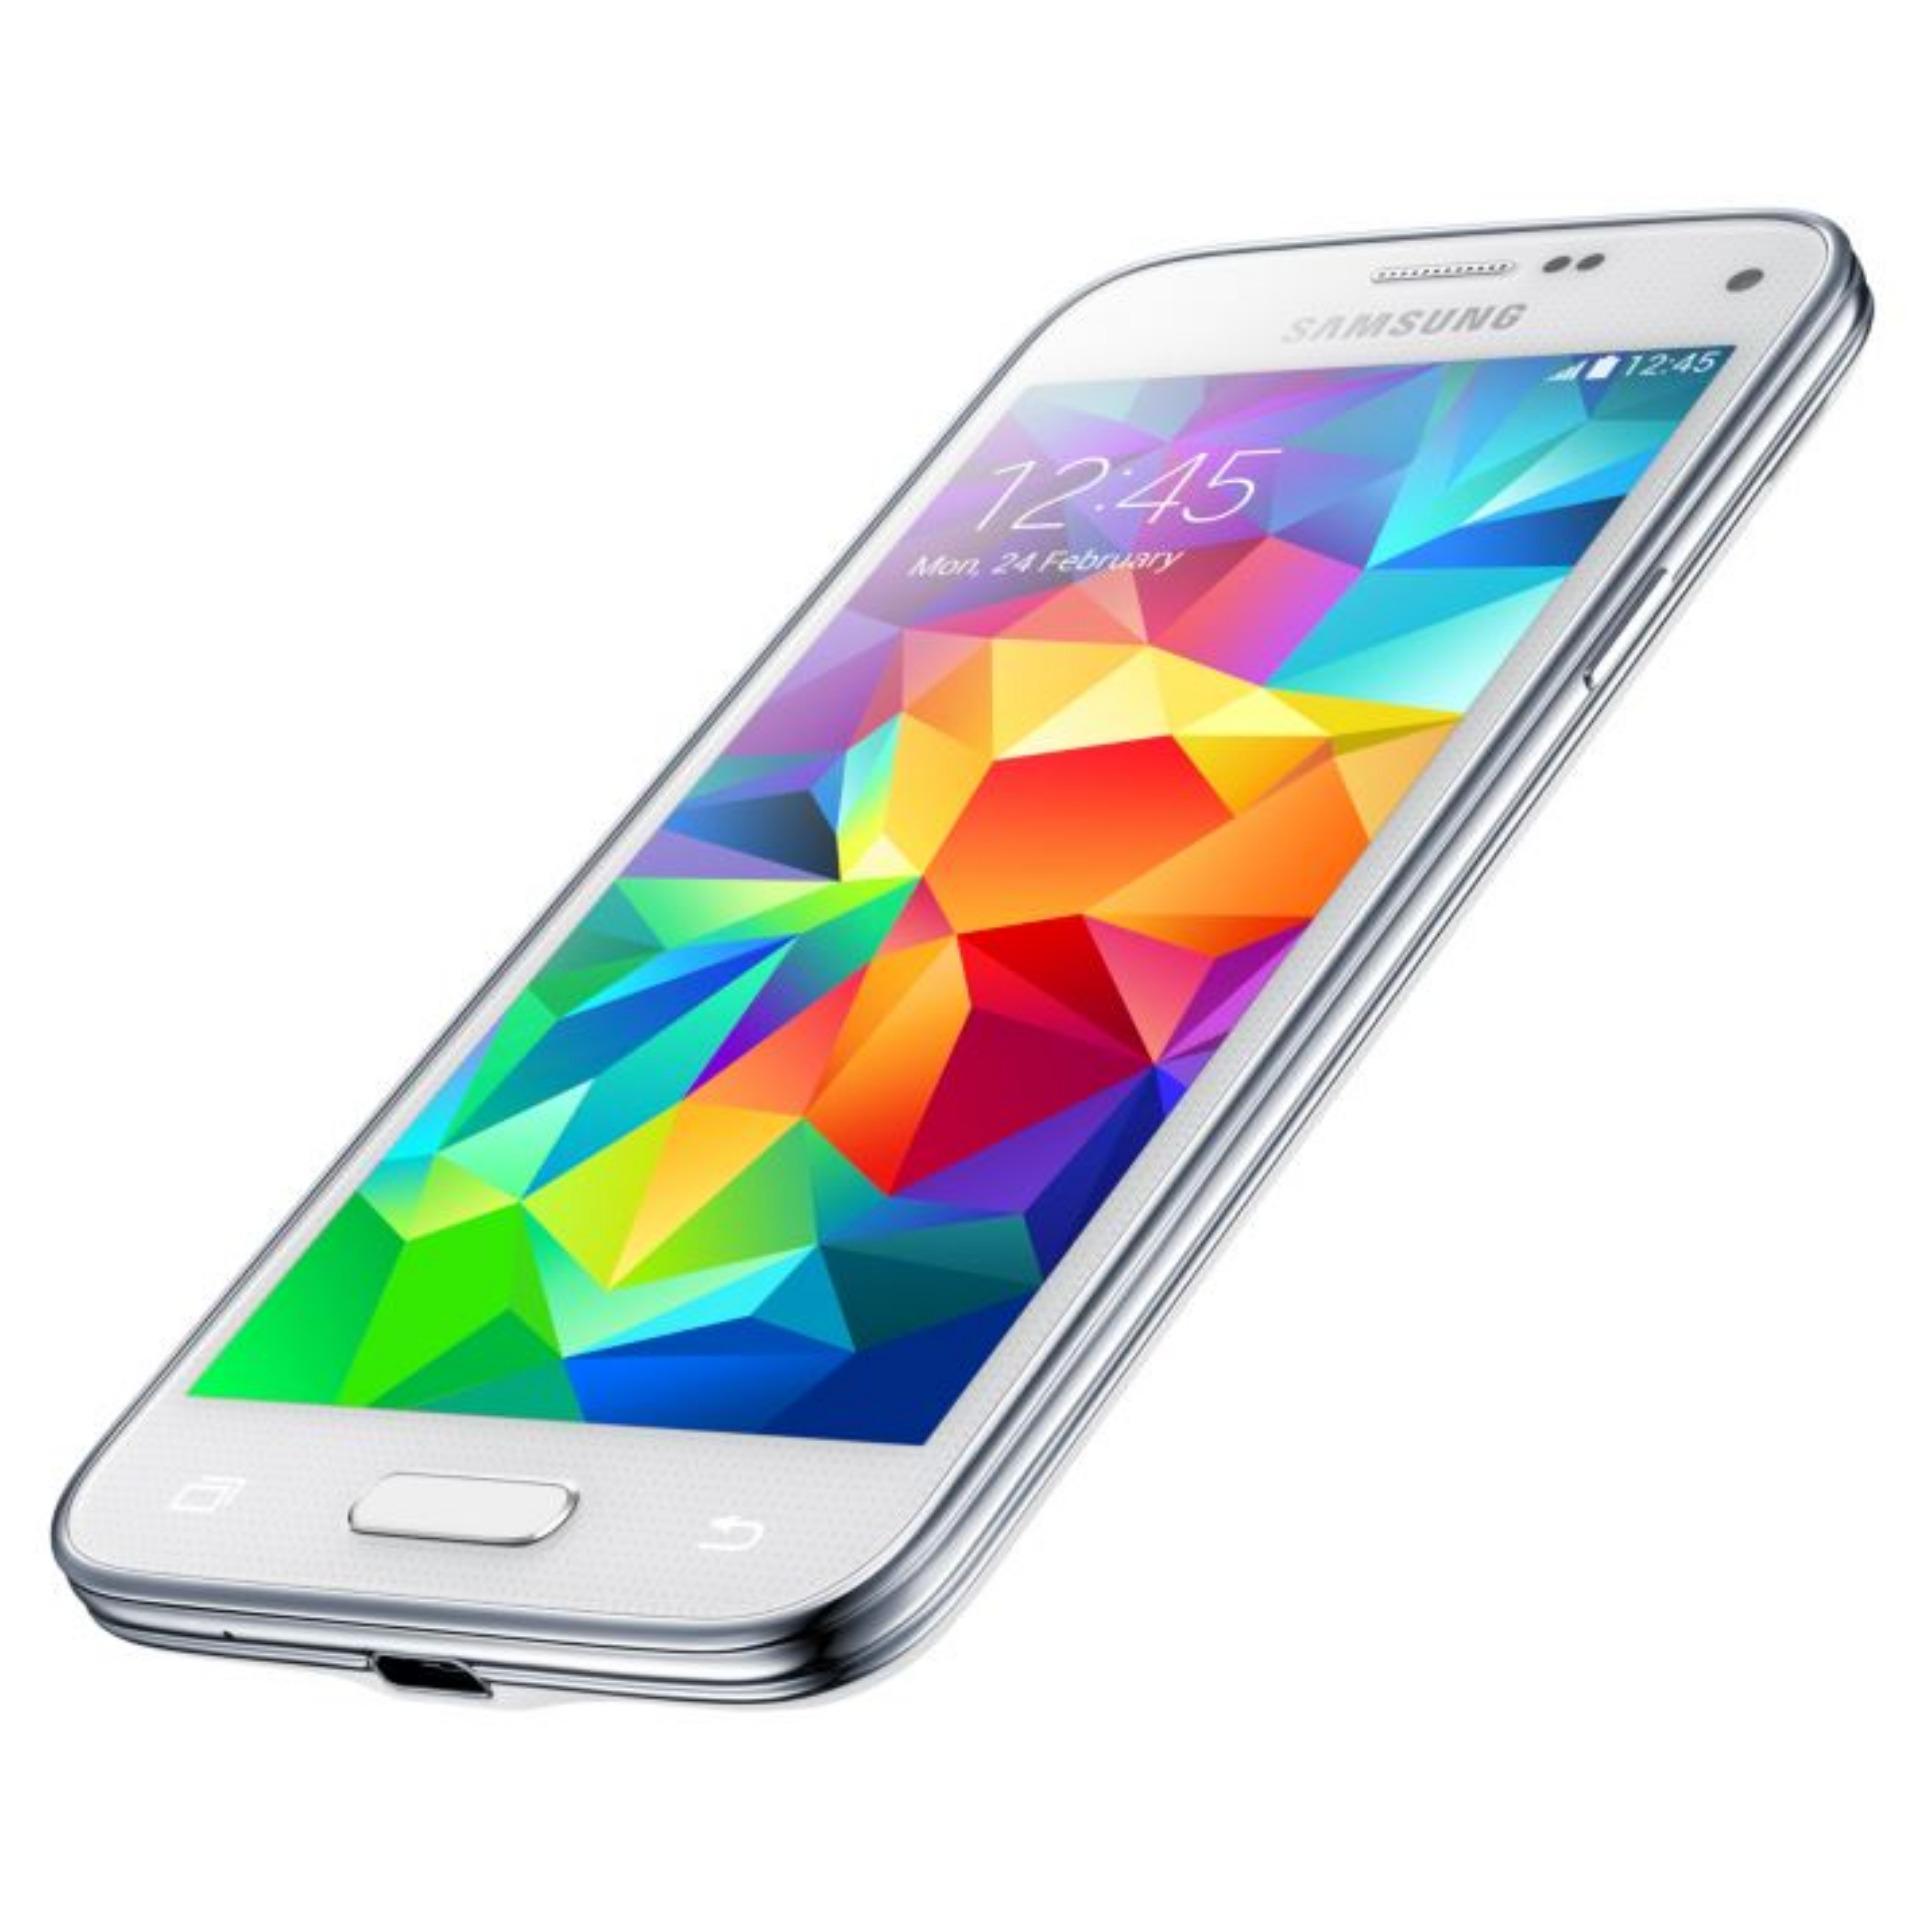 Terbaik Murah Samsung Galaxy S5 Sm G900 16gb White Grade A Cari V2 J106 8gb Putih